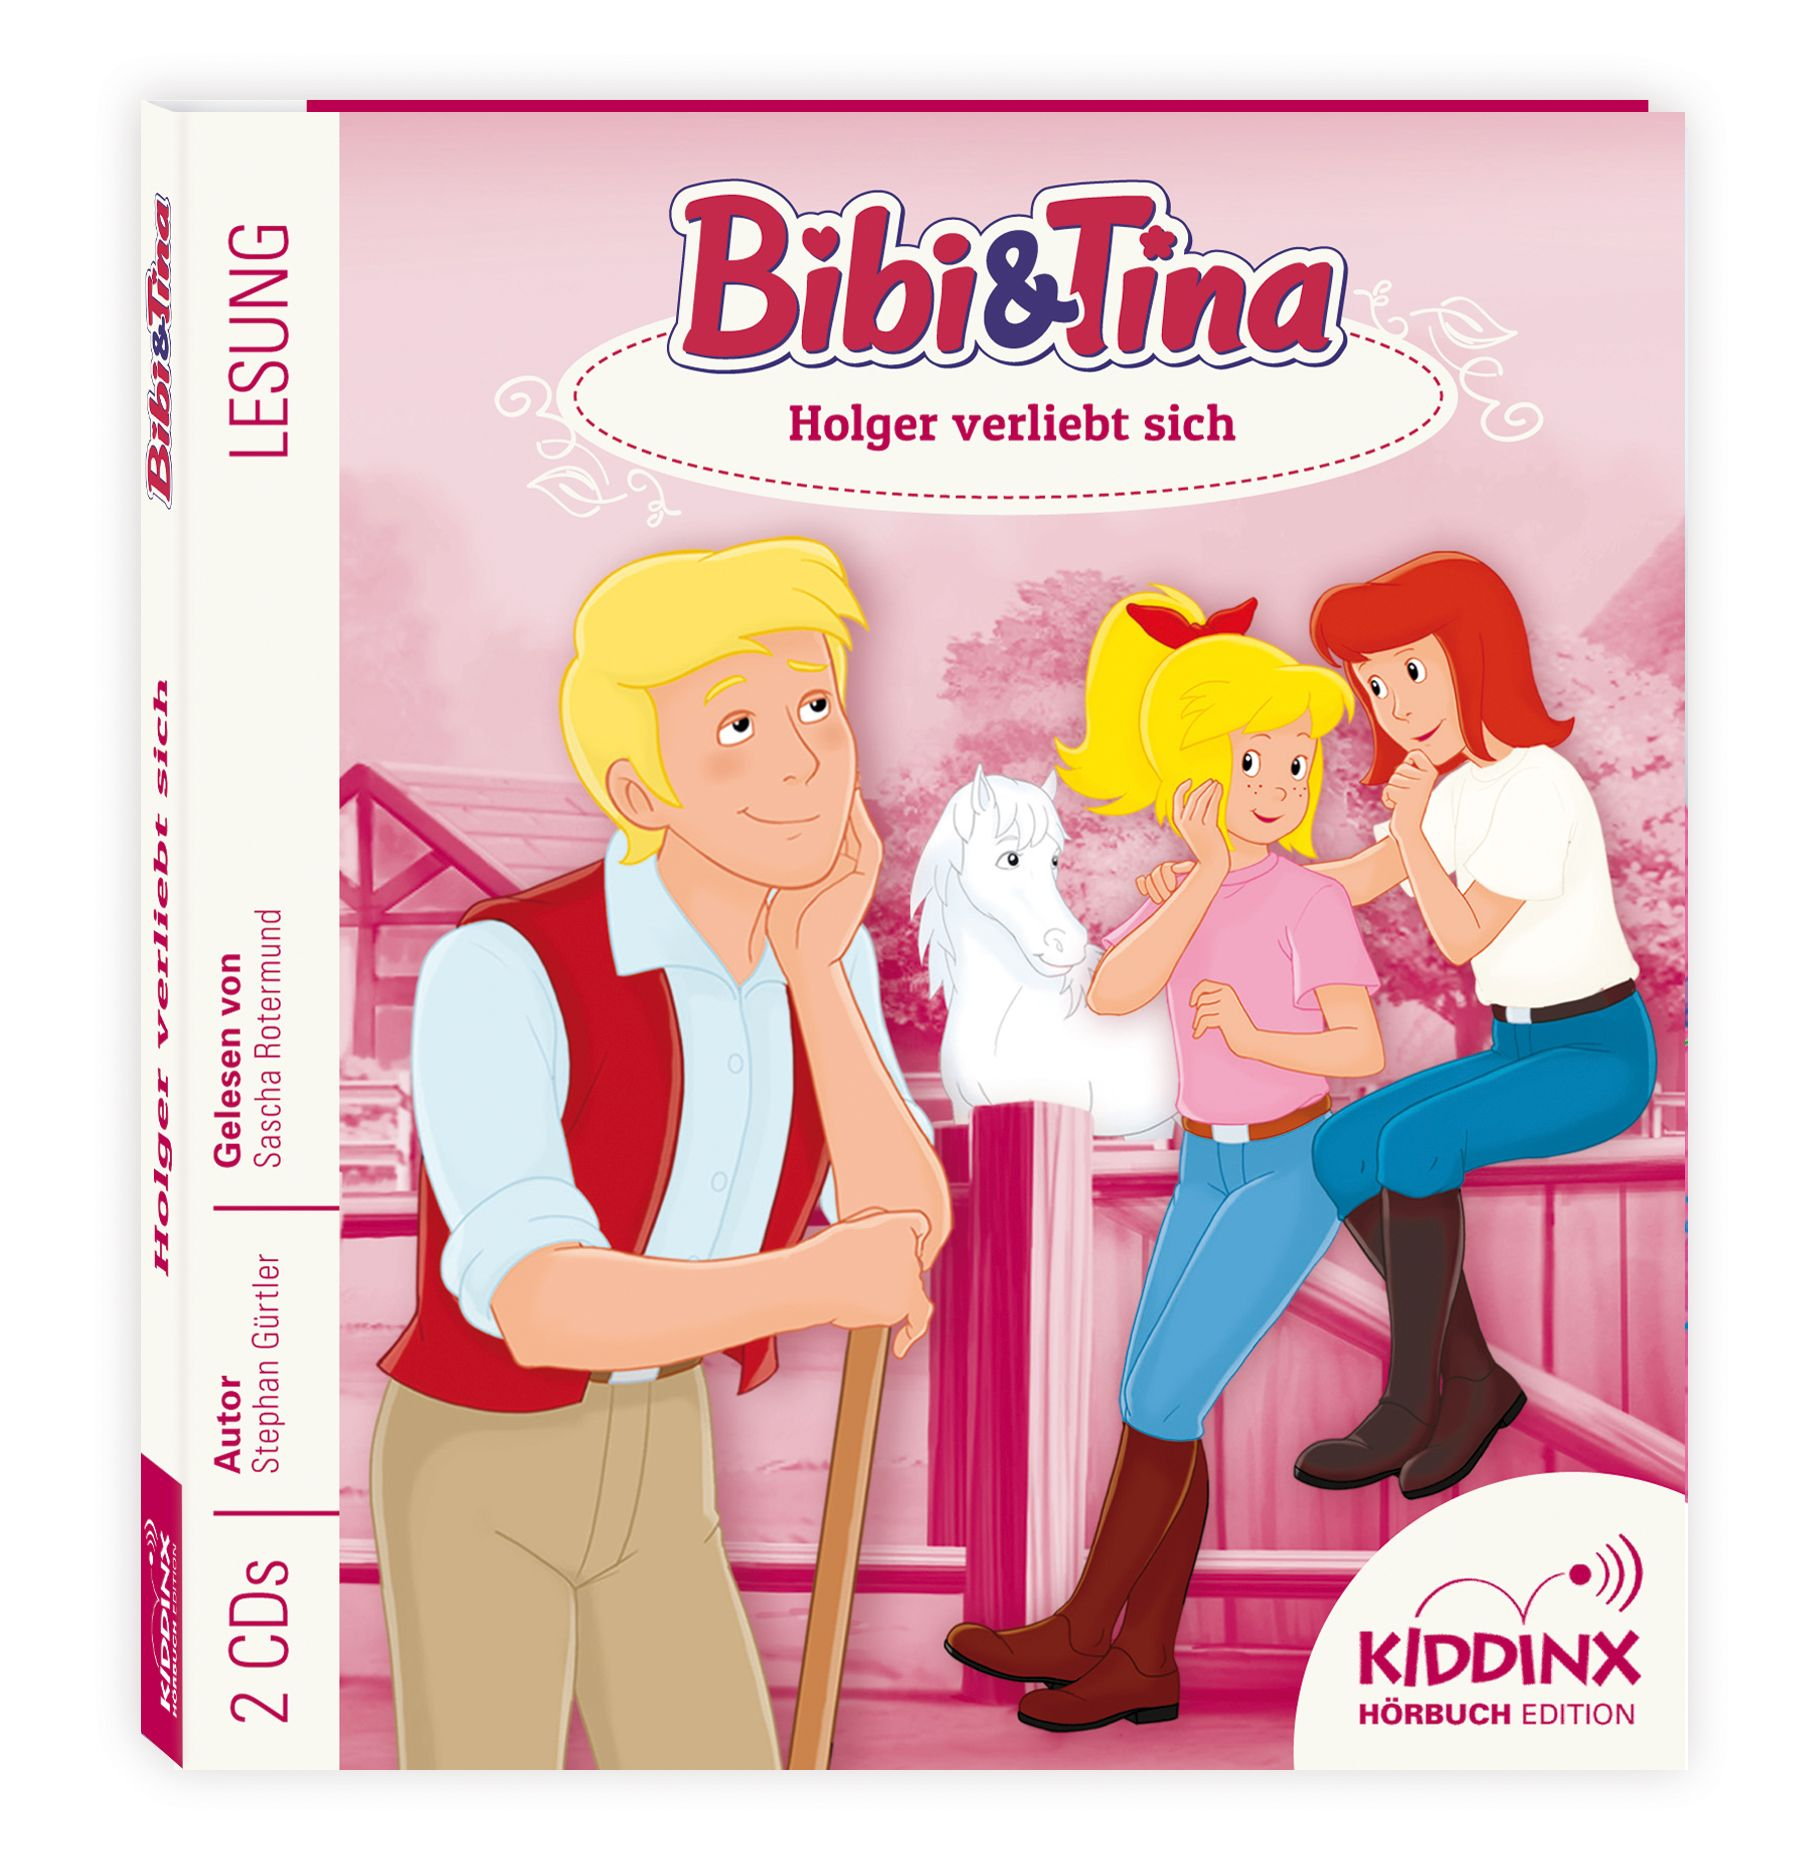 Bibi & Tina Hörbuch: Holger verliebt sich